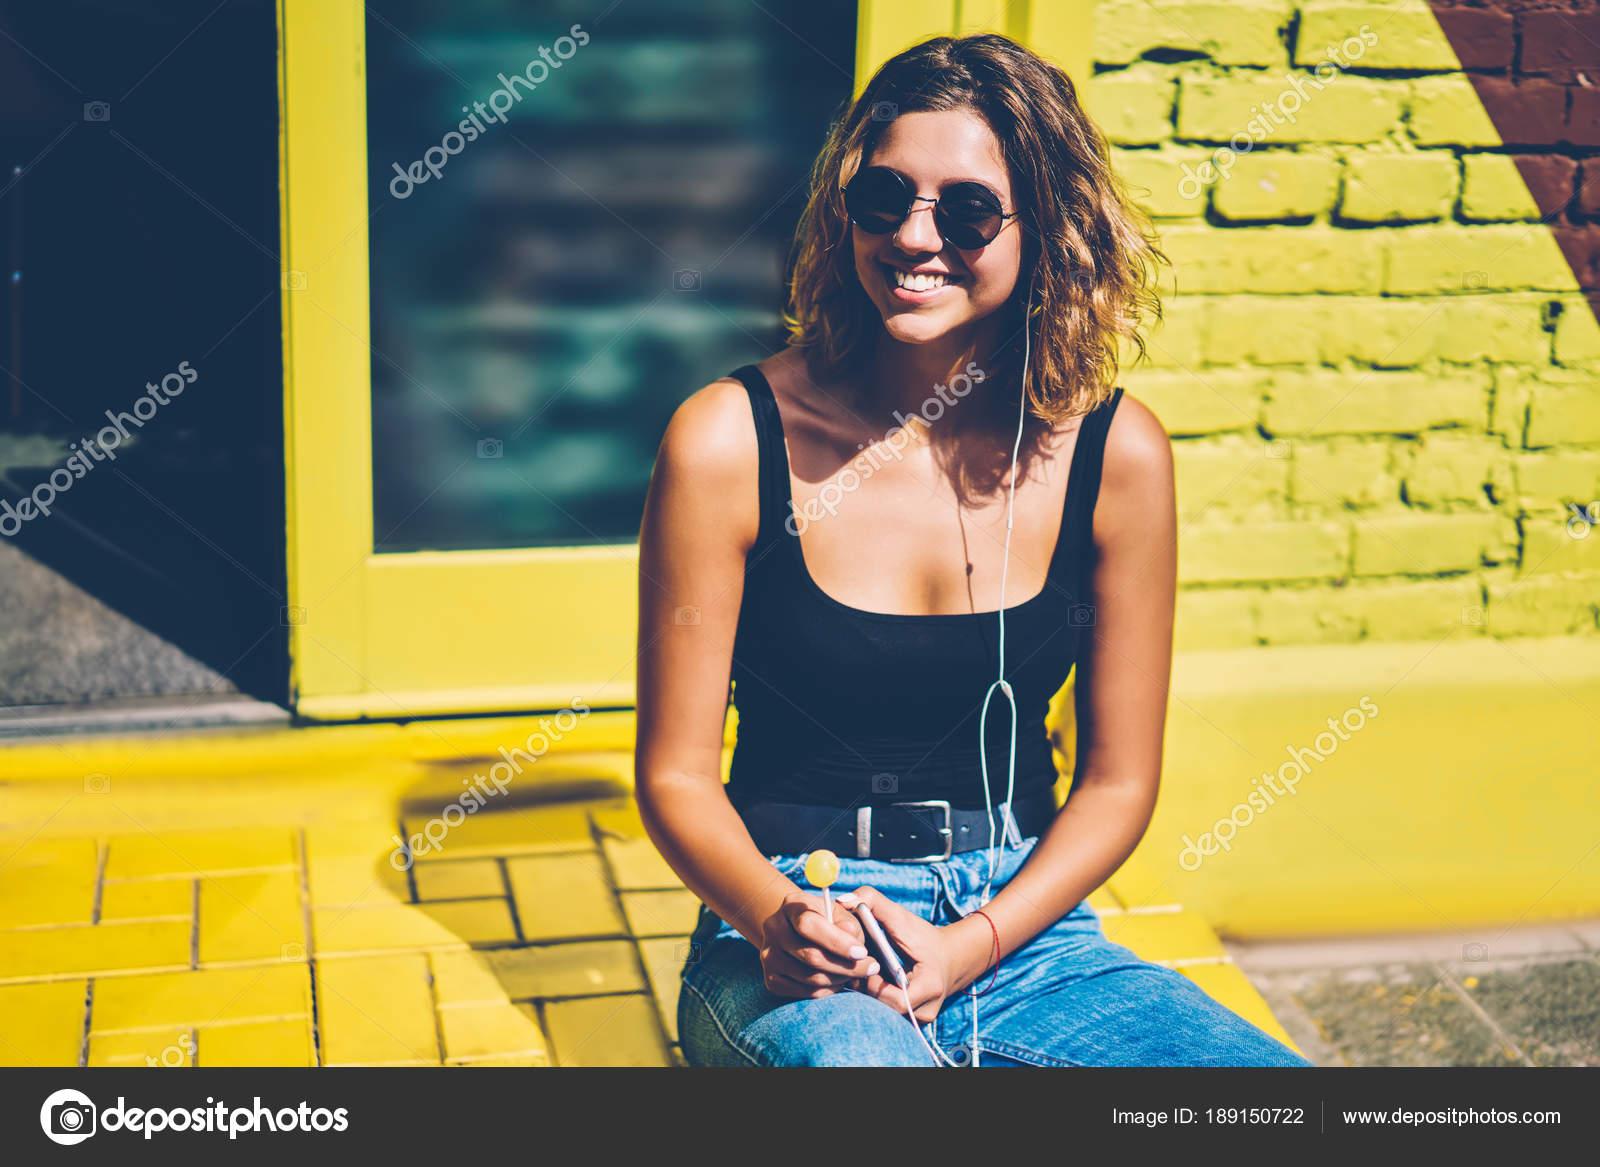 Cheerful Young Woman Sunglasses Lollipop Listening Radio